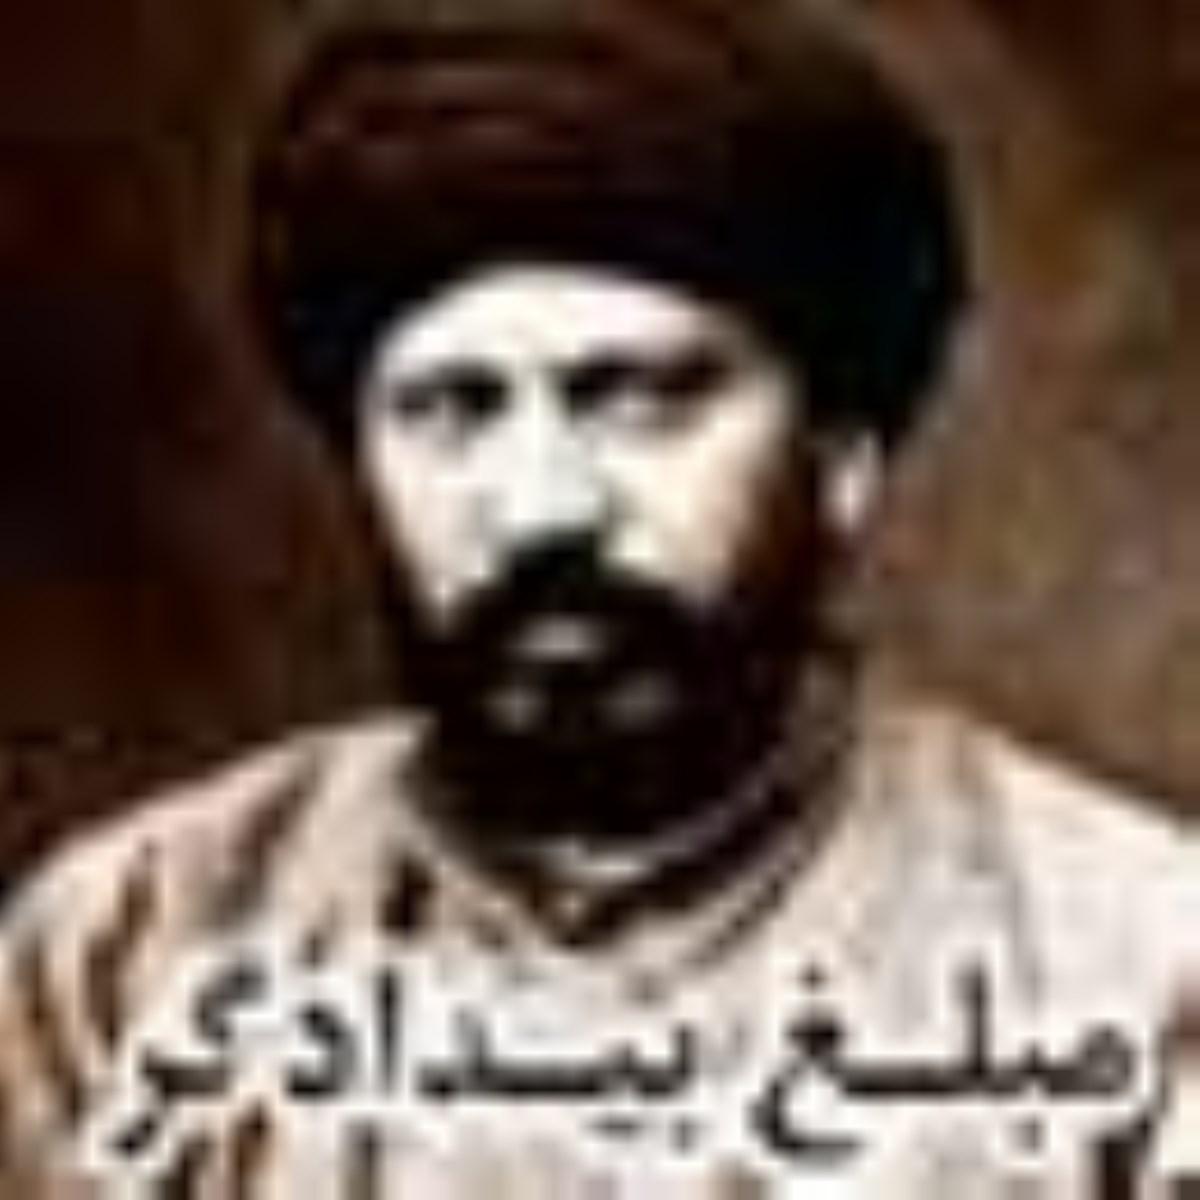 مبلغ بیدارگر(سید جمال الدین اسدآبادی)